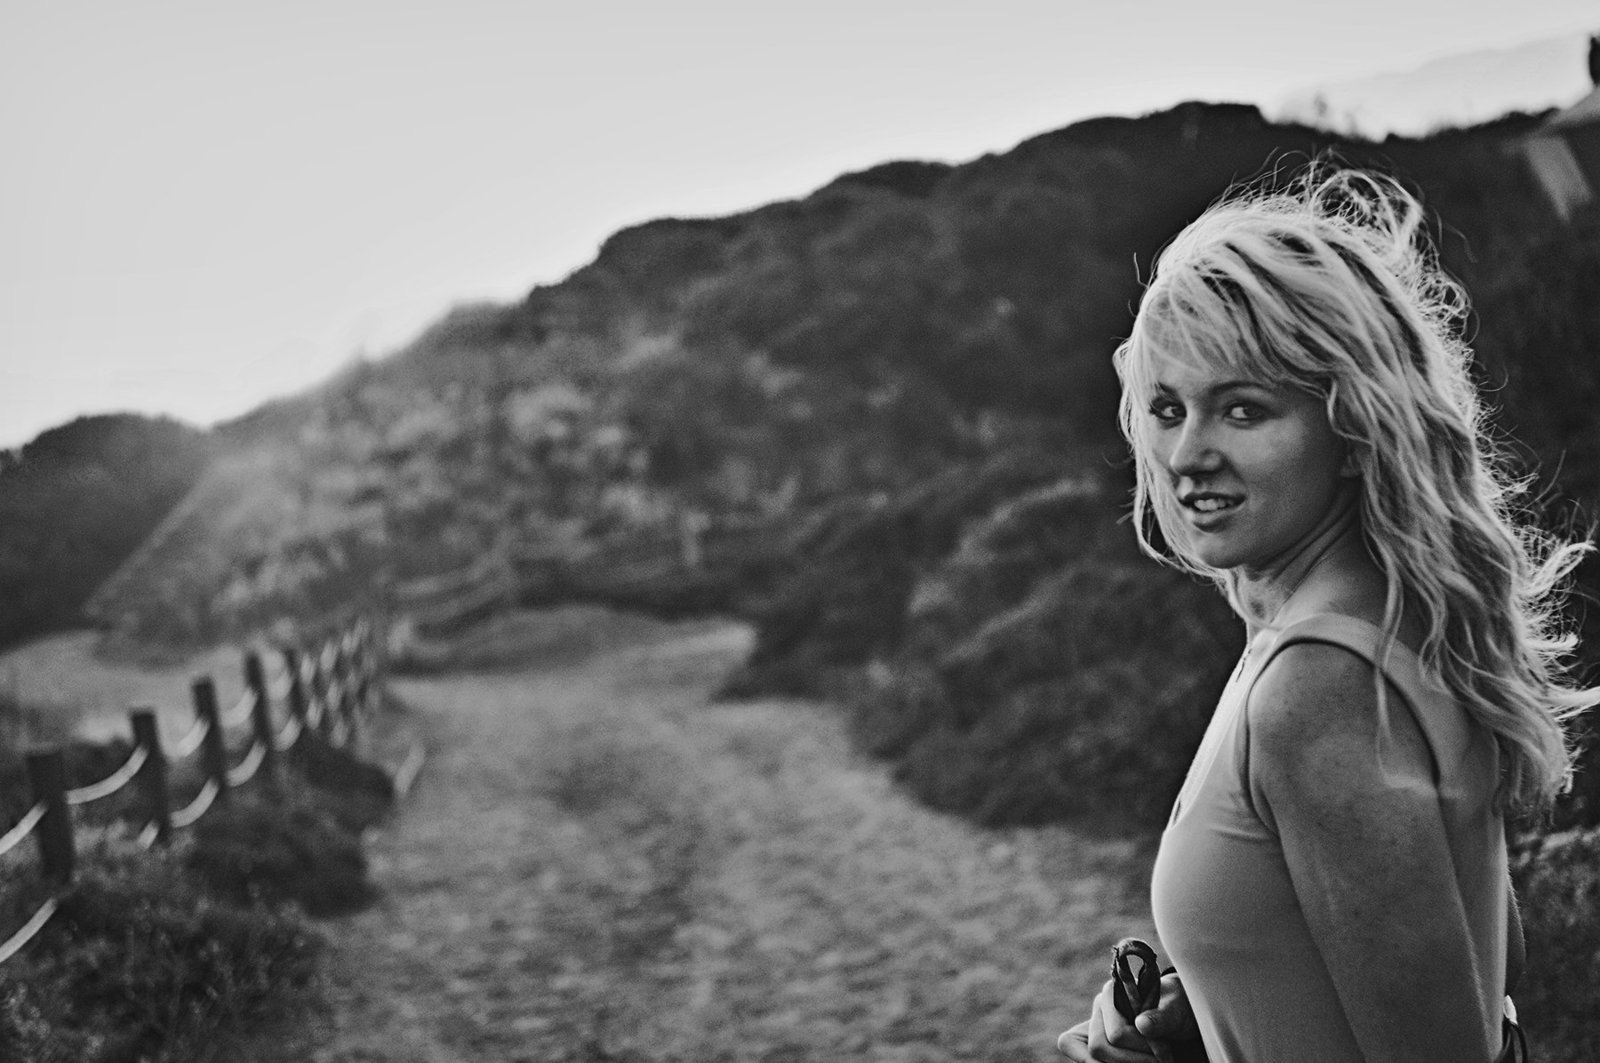 san francisco california senior photos destination portrait photographer bryan newfield photography 61